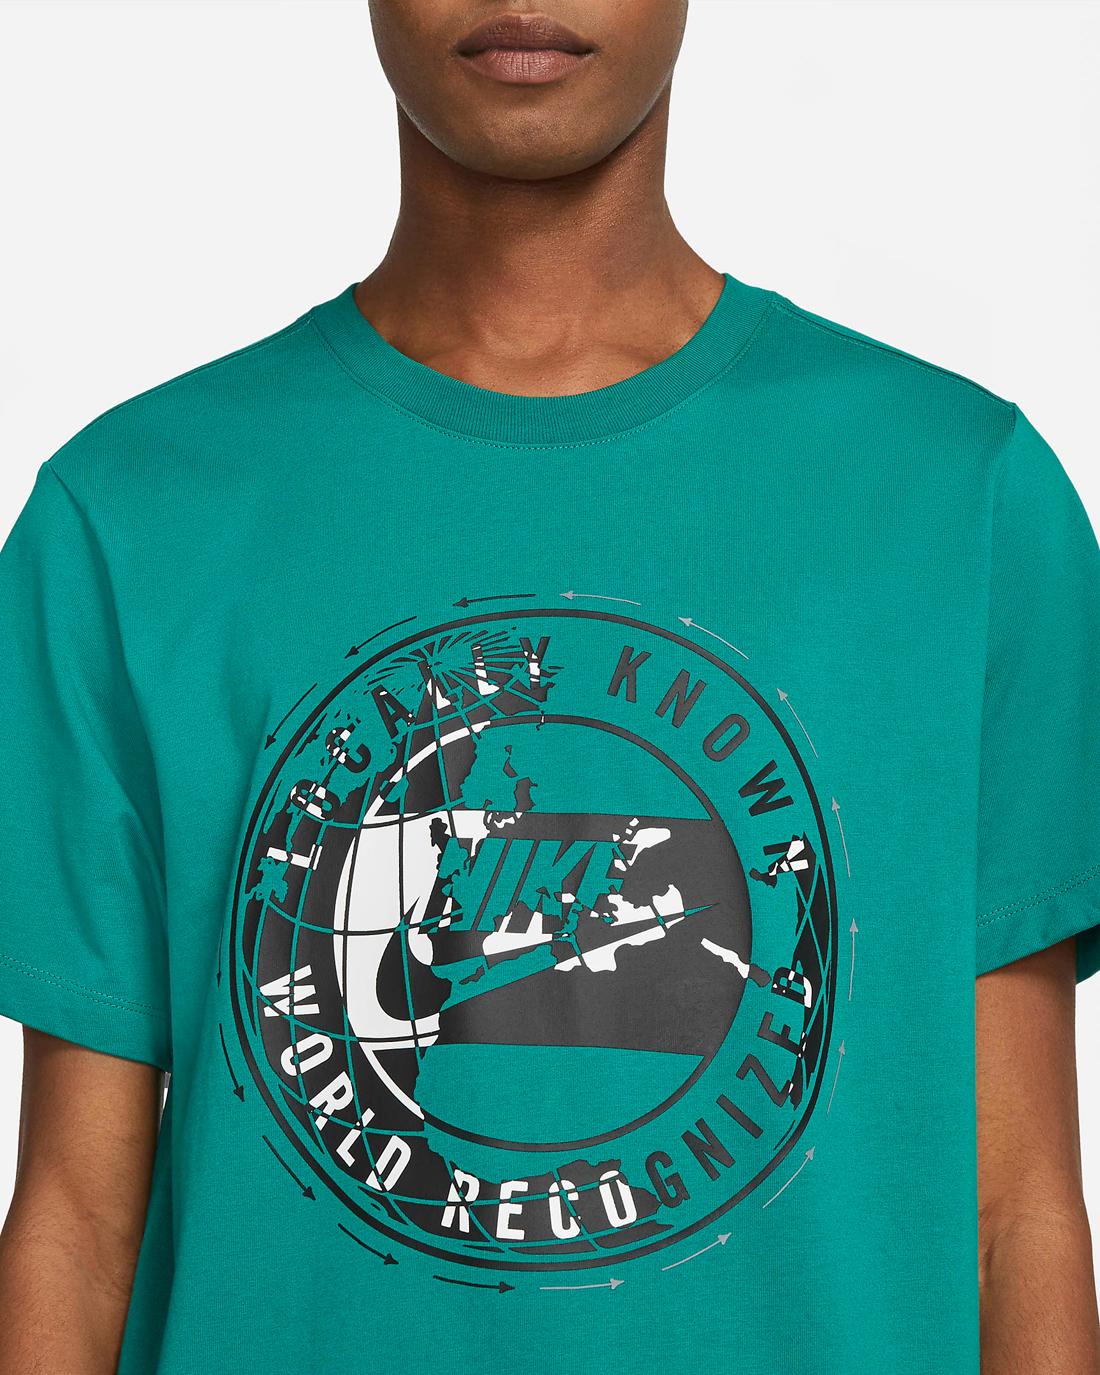 nike-air-vapormax-plus-atlanta-city-special-shirt-1